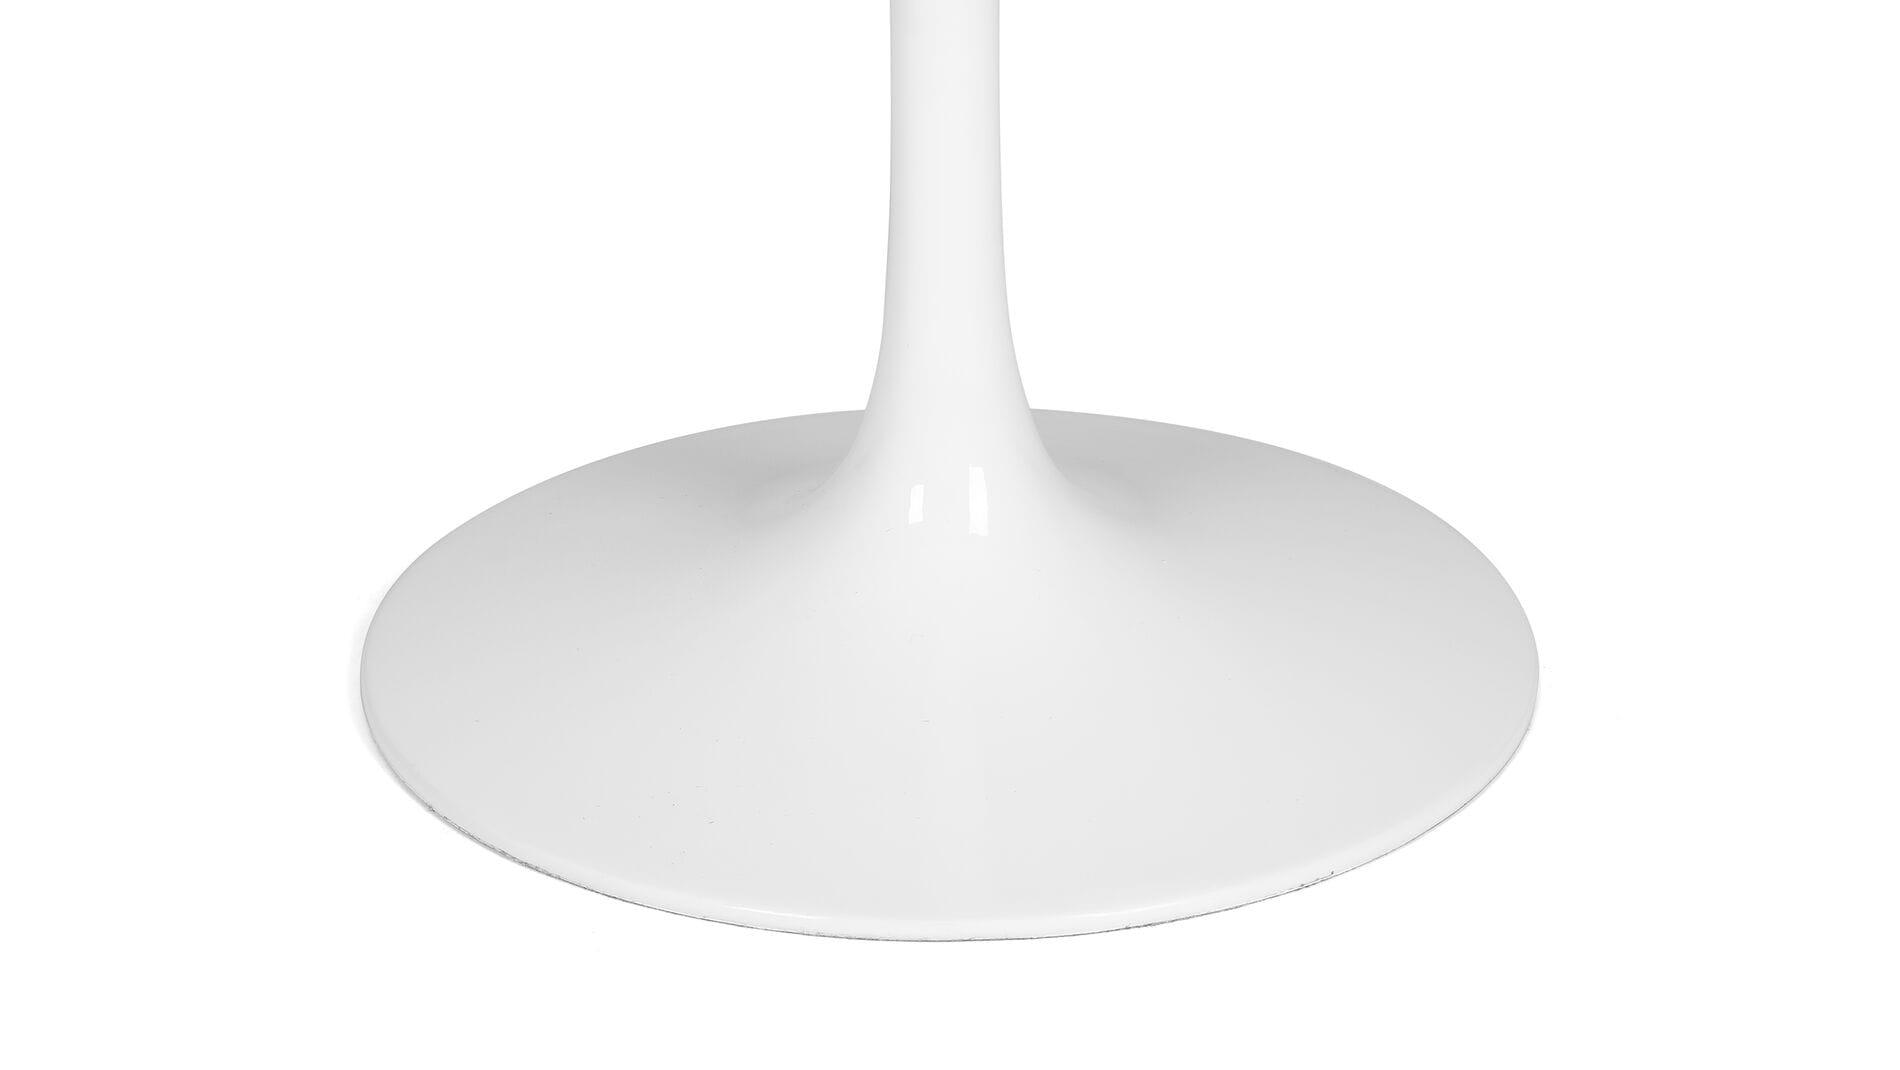 Стол обеденный Tulip Stone диаметр 100